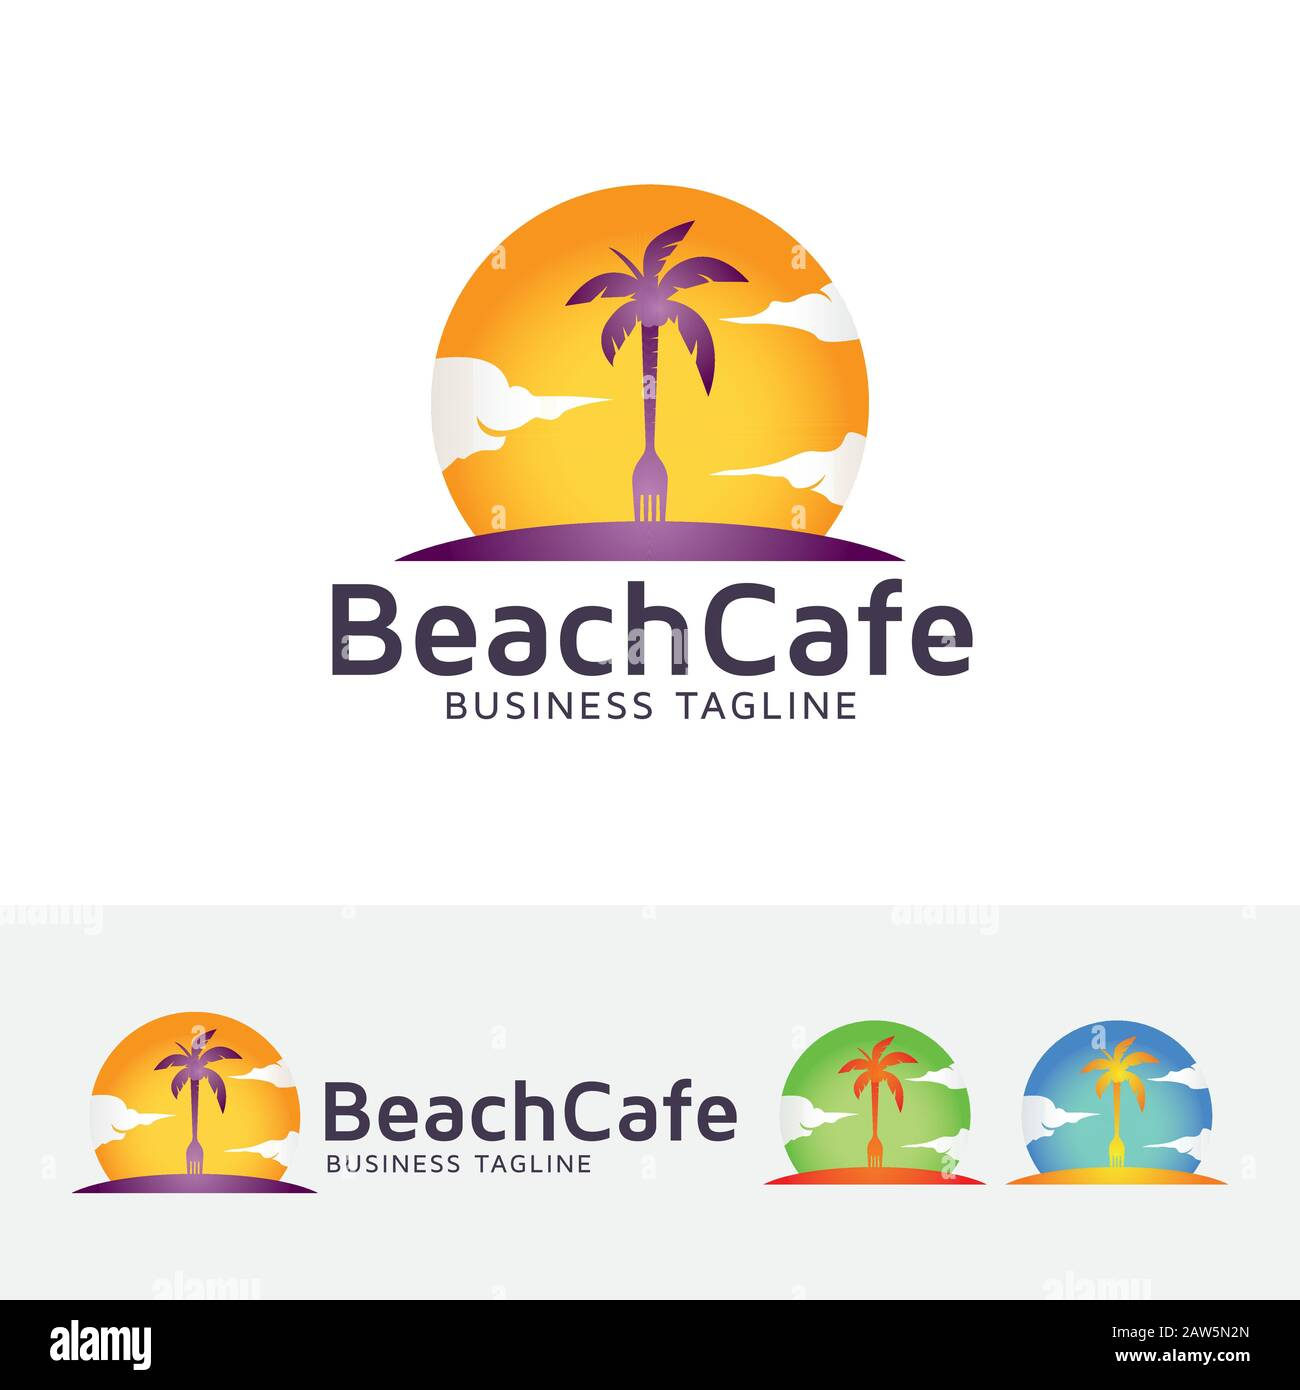 Creative Beach Logo Design Resort And Restaurant Logo Template Stock Vector Image Art Alamy